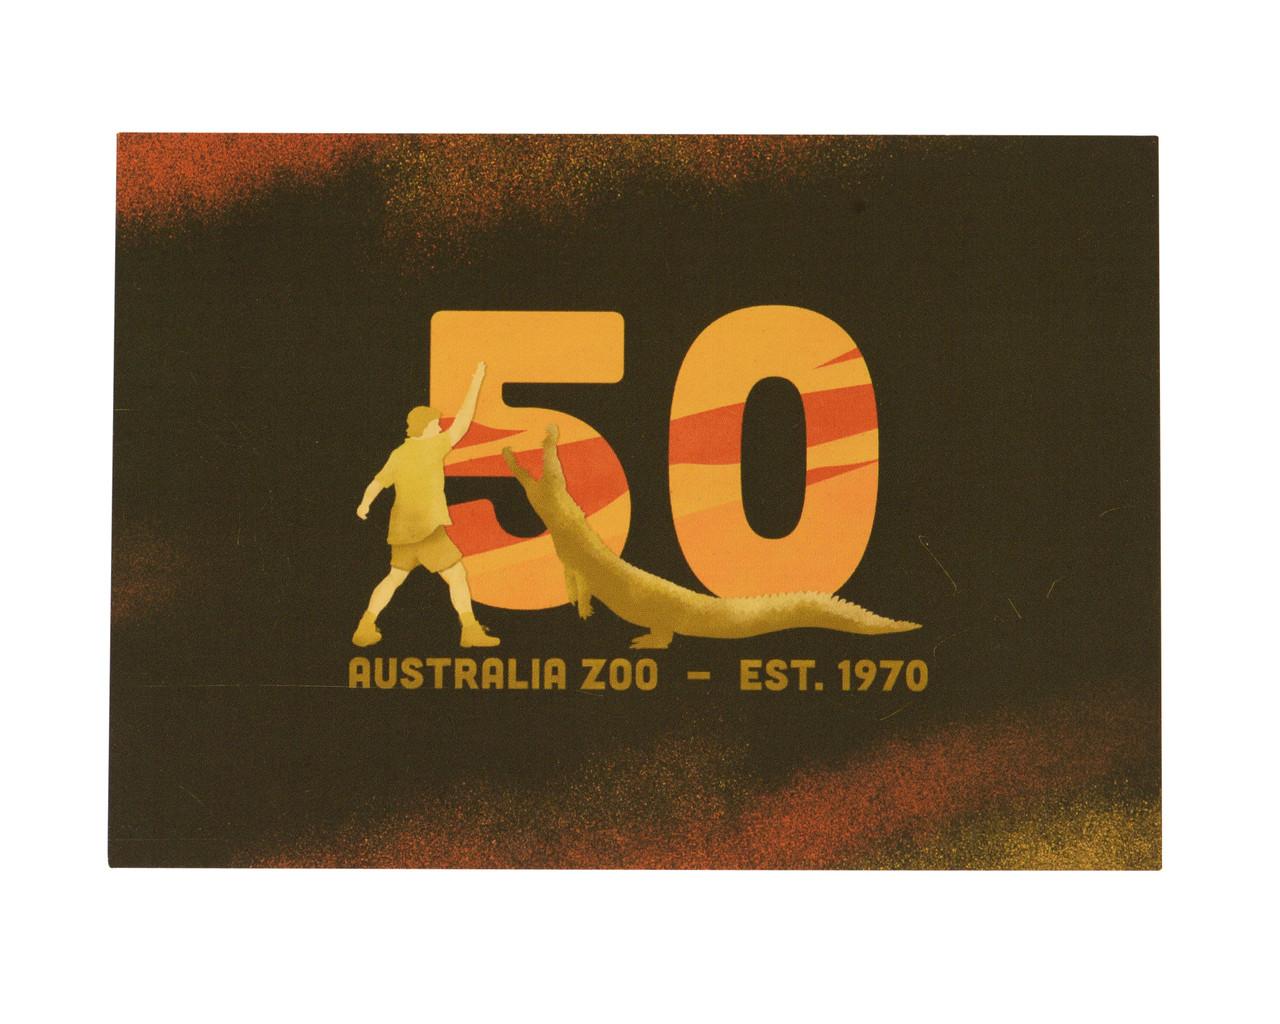 Australia Zoo Celebrating 50 Years Postcard